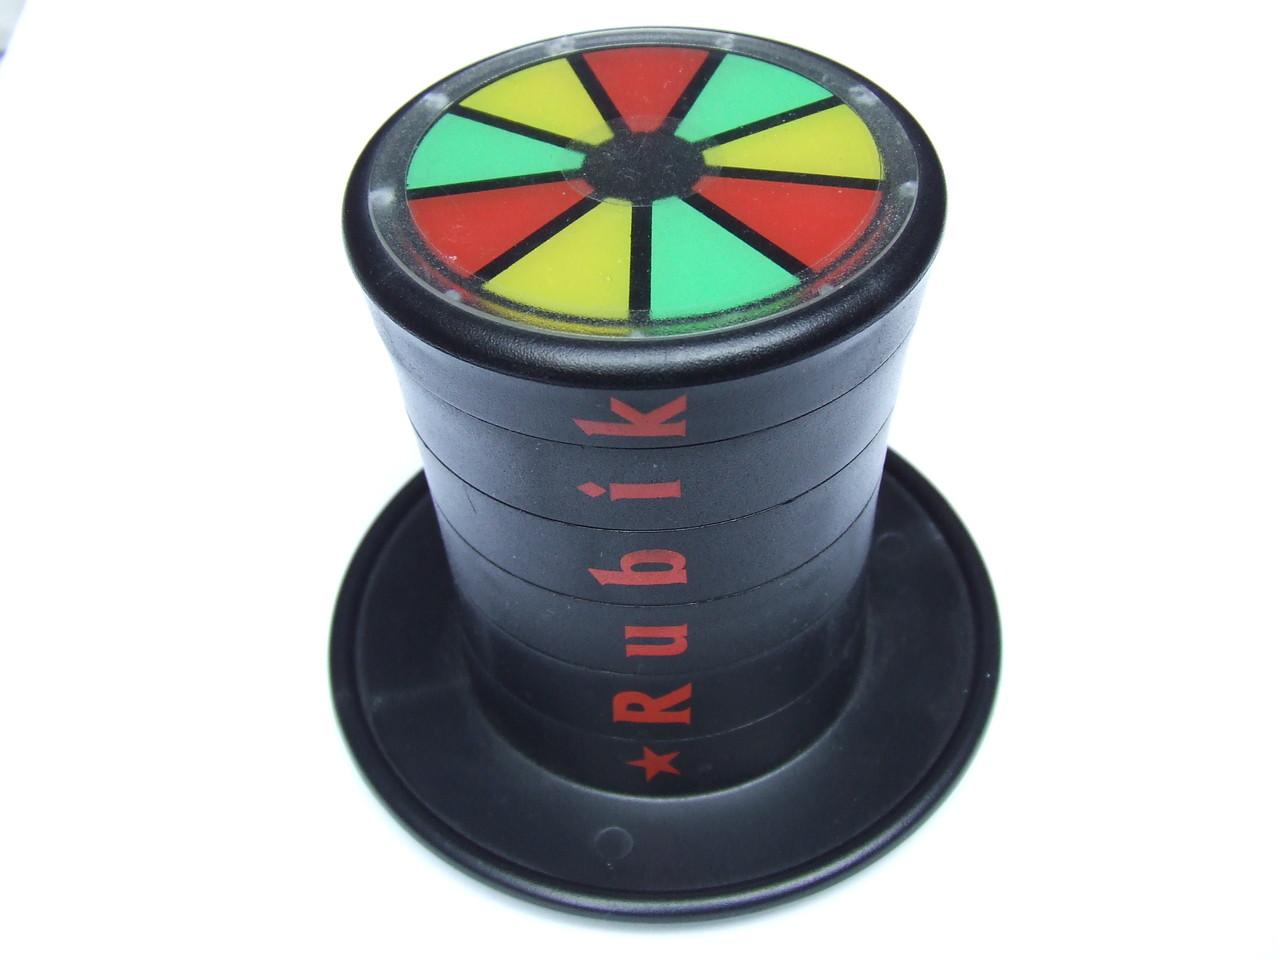 Rubik's Hat